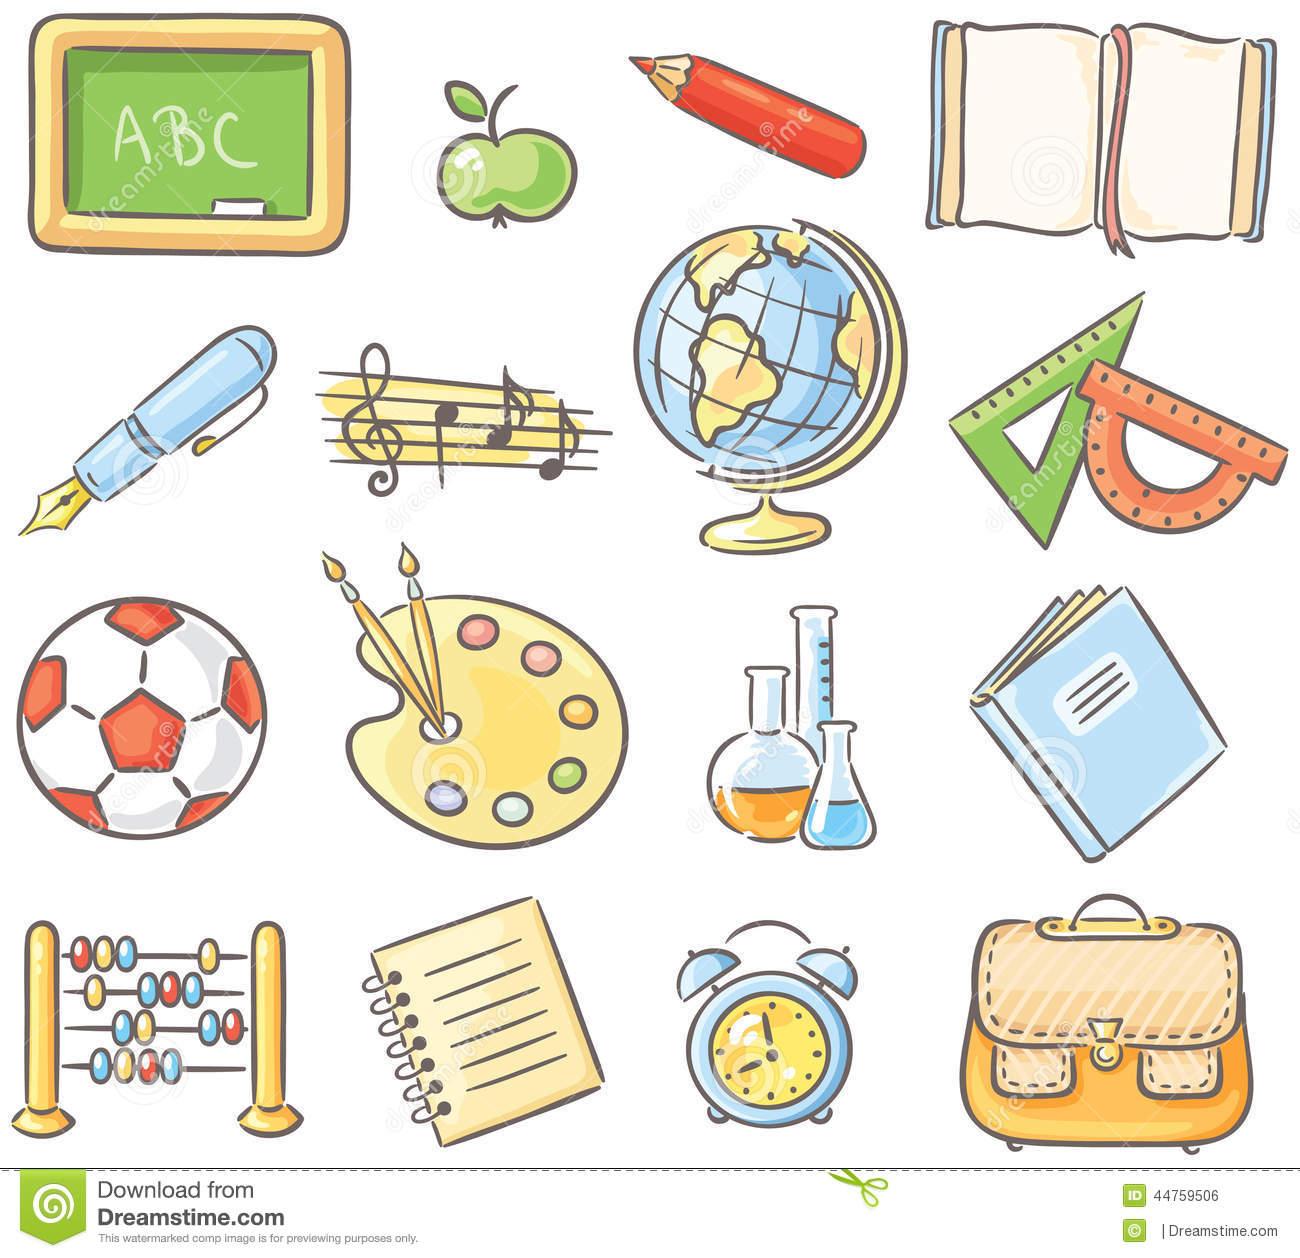 School Thing Stock Illustrations u2013 460 School Thing Stock Illustrations,  Vectors u0026 Clipart - Dreamstime